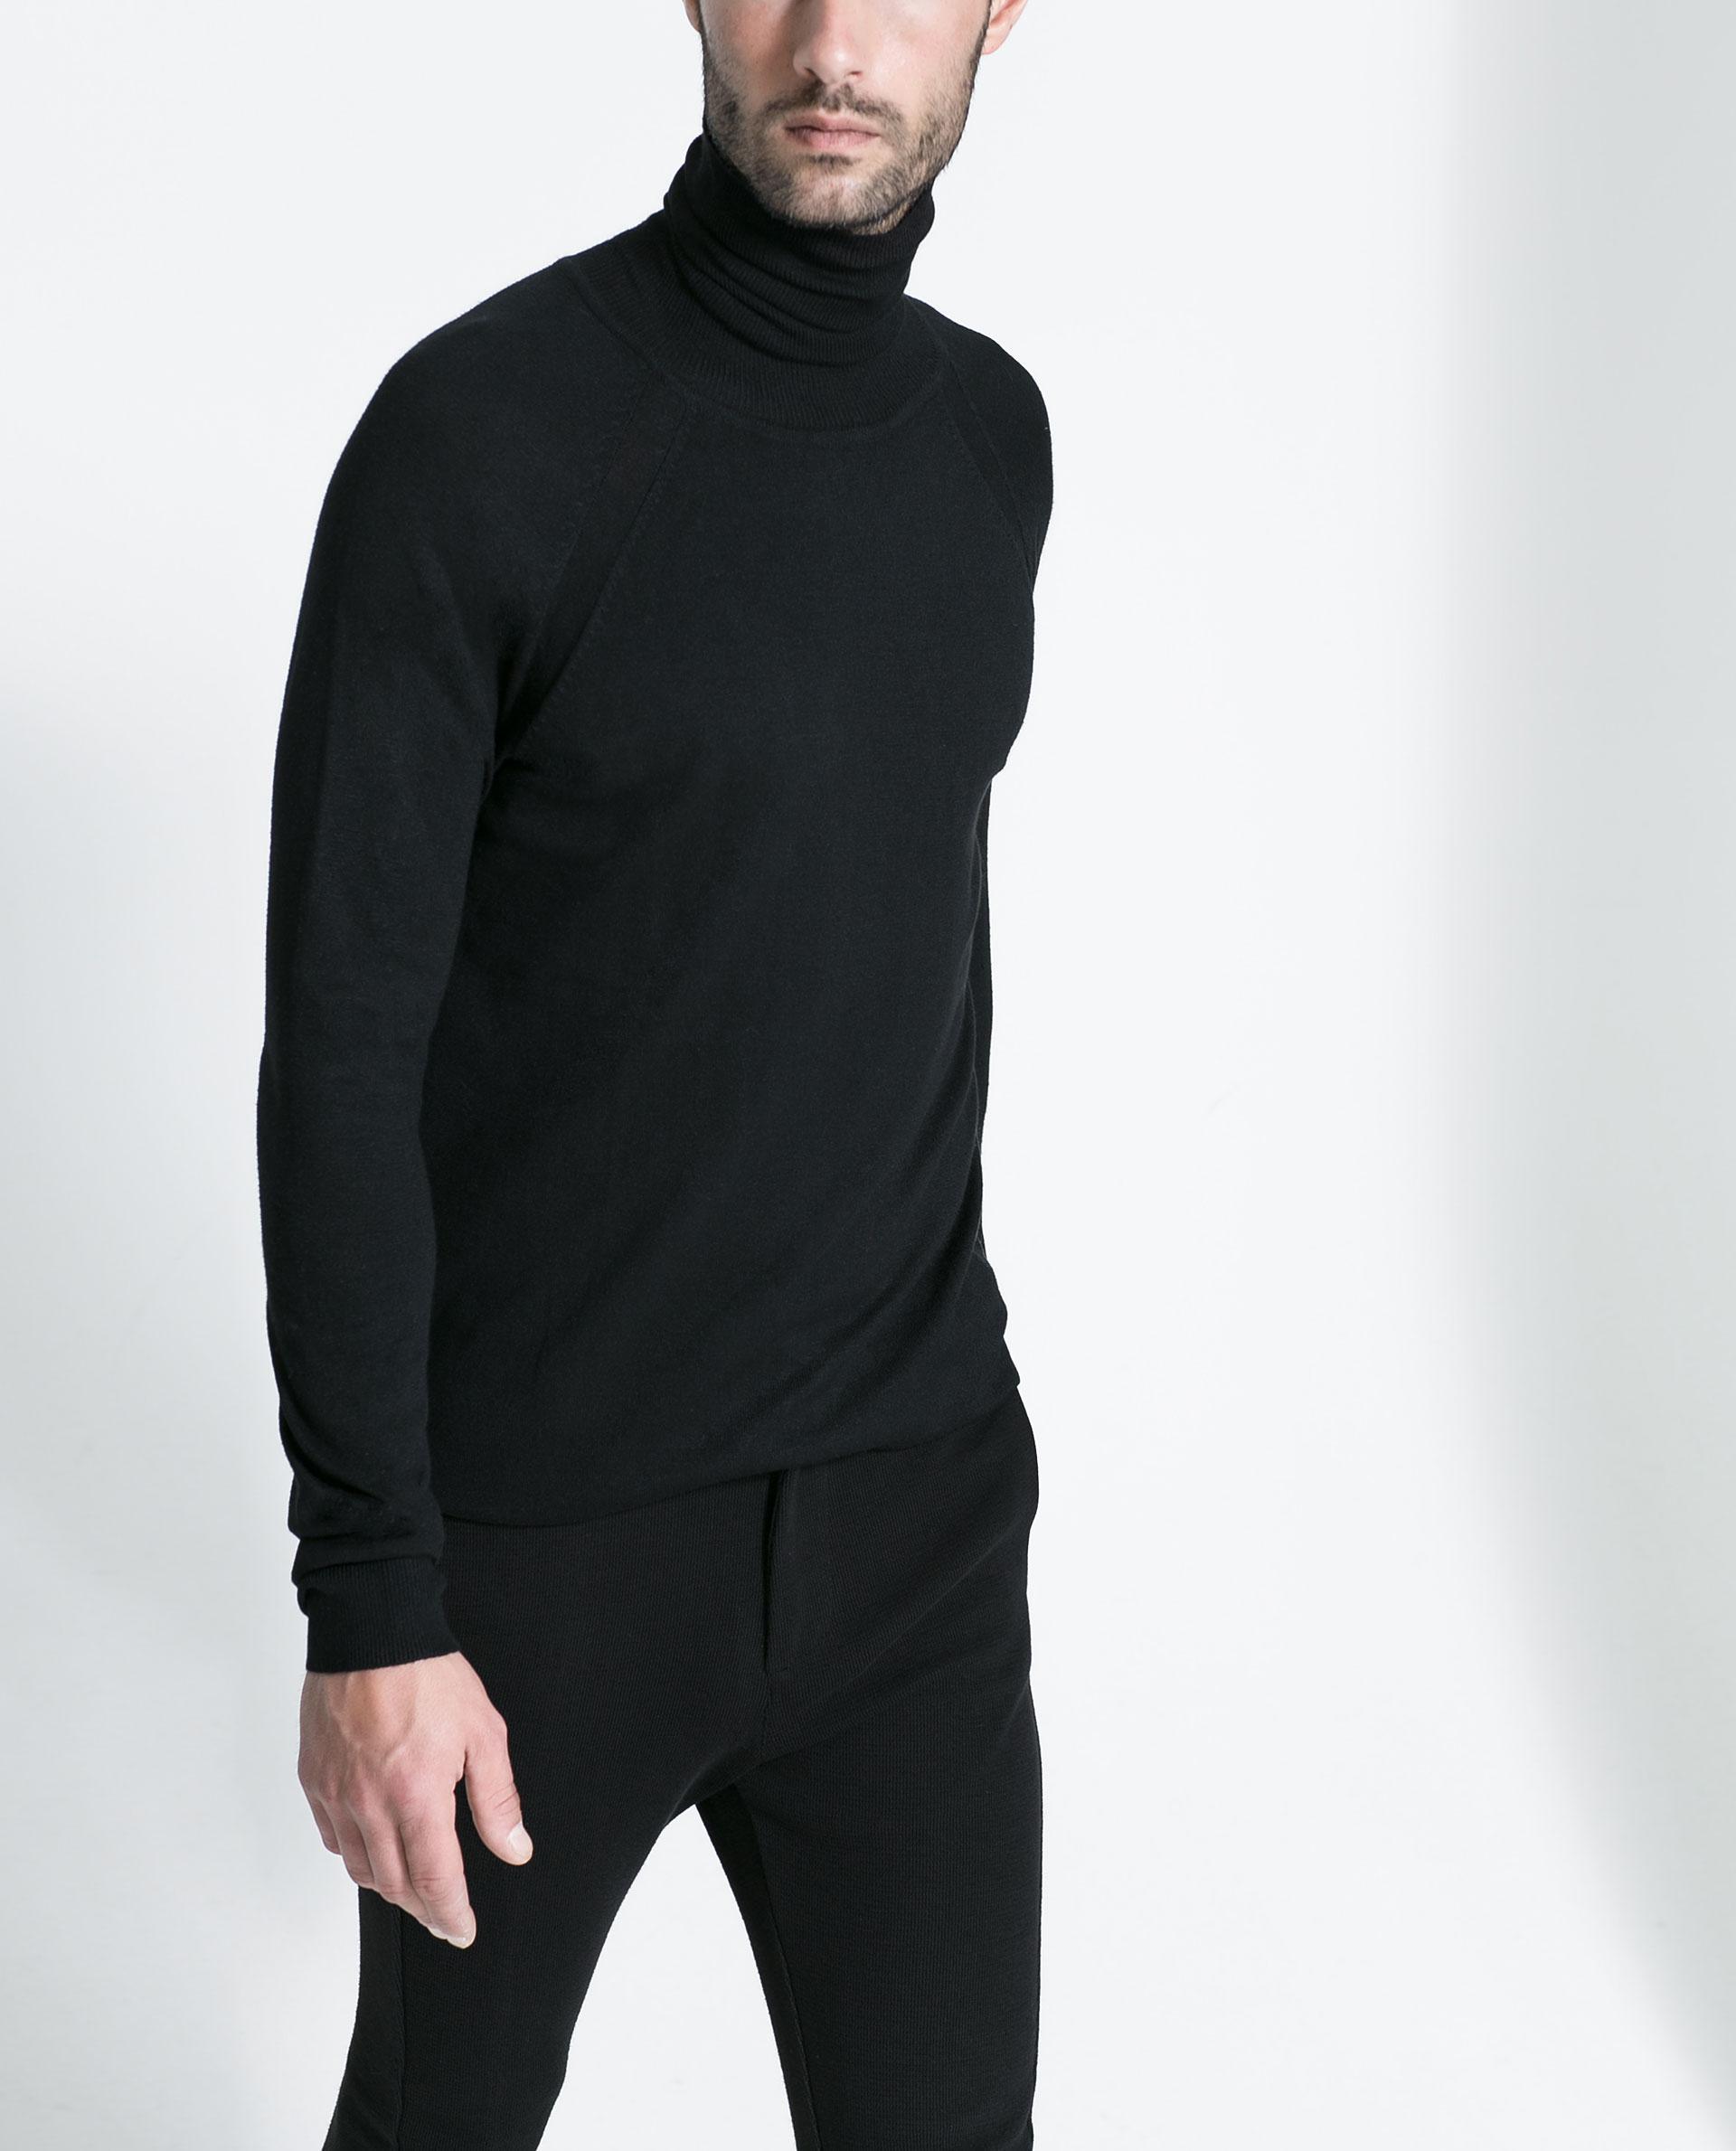 Zara Turtleneck Sweater Mens 39